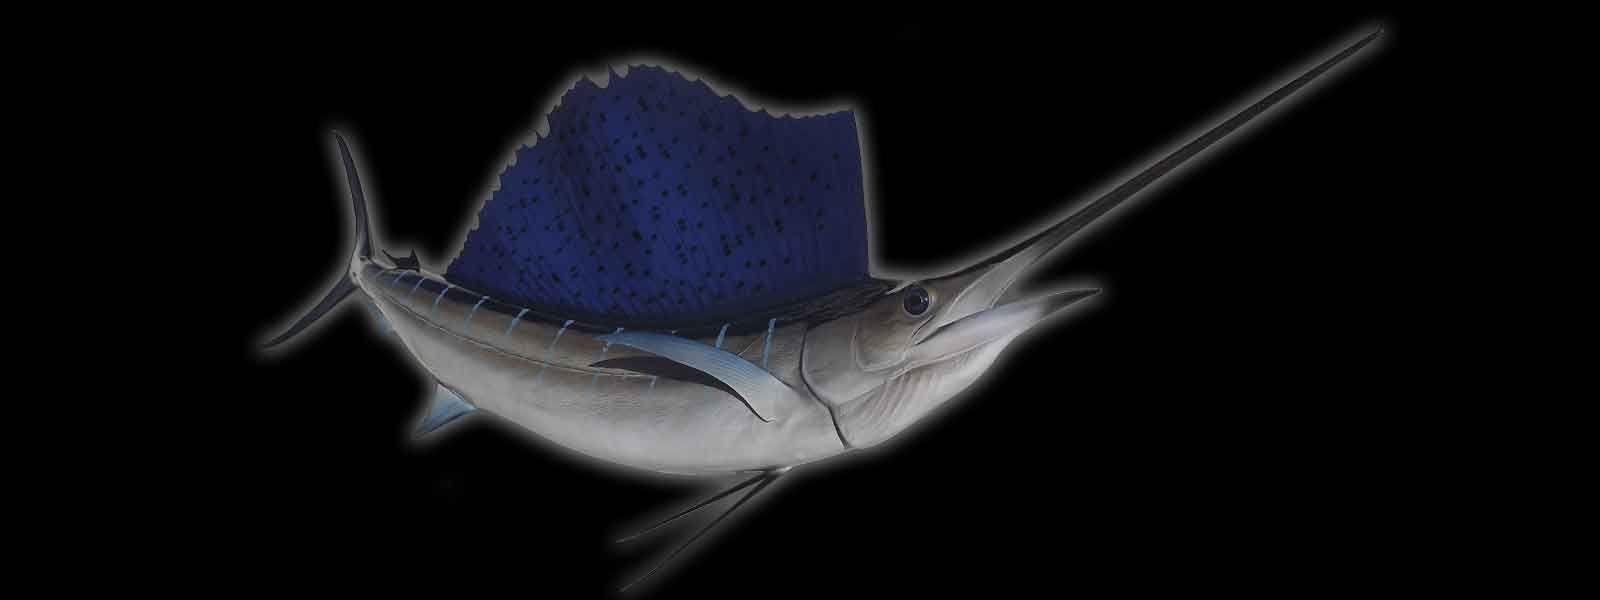 Pin by craig026 on rohanrj fish mounts fish